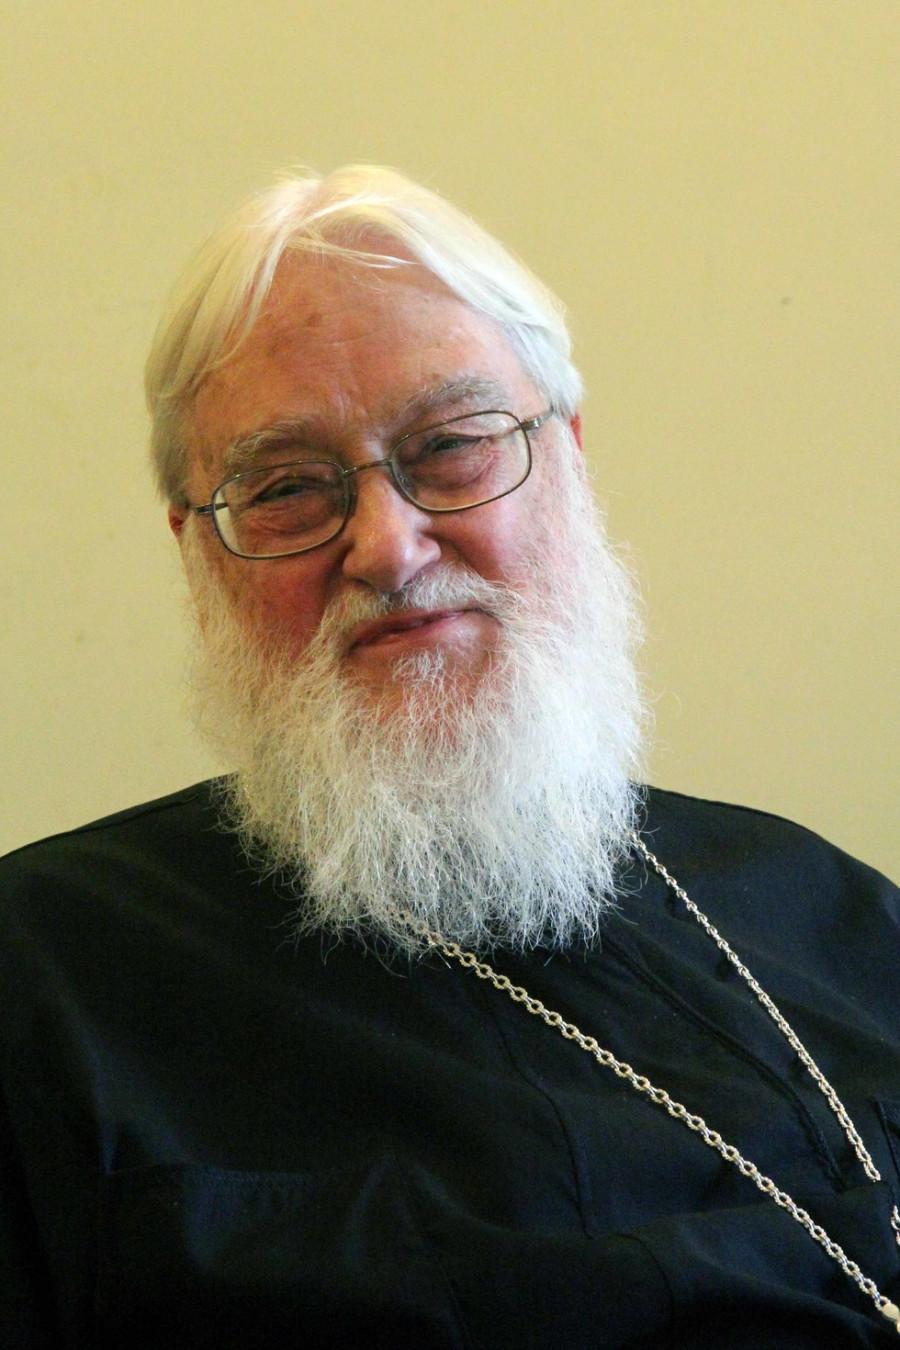 Metropolitan Kallistos (Ware), Professor of Theology at the University of Oxford in 1966-2001